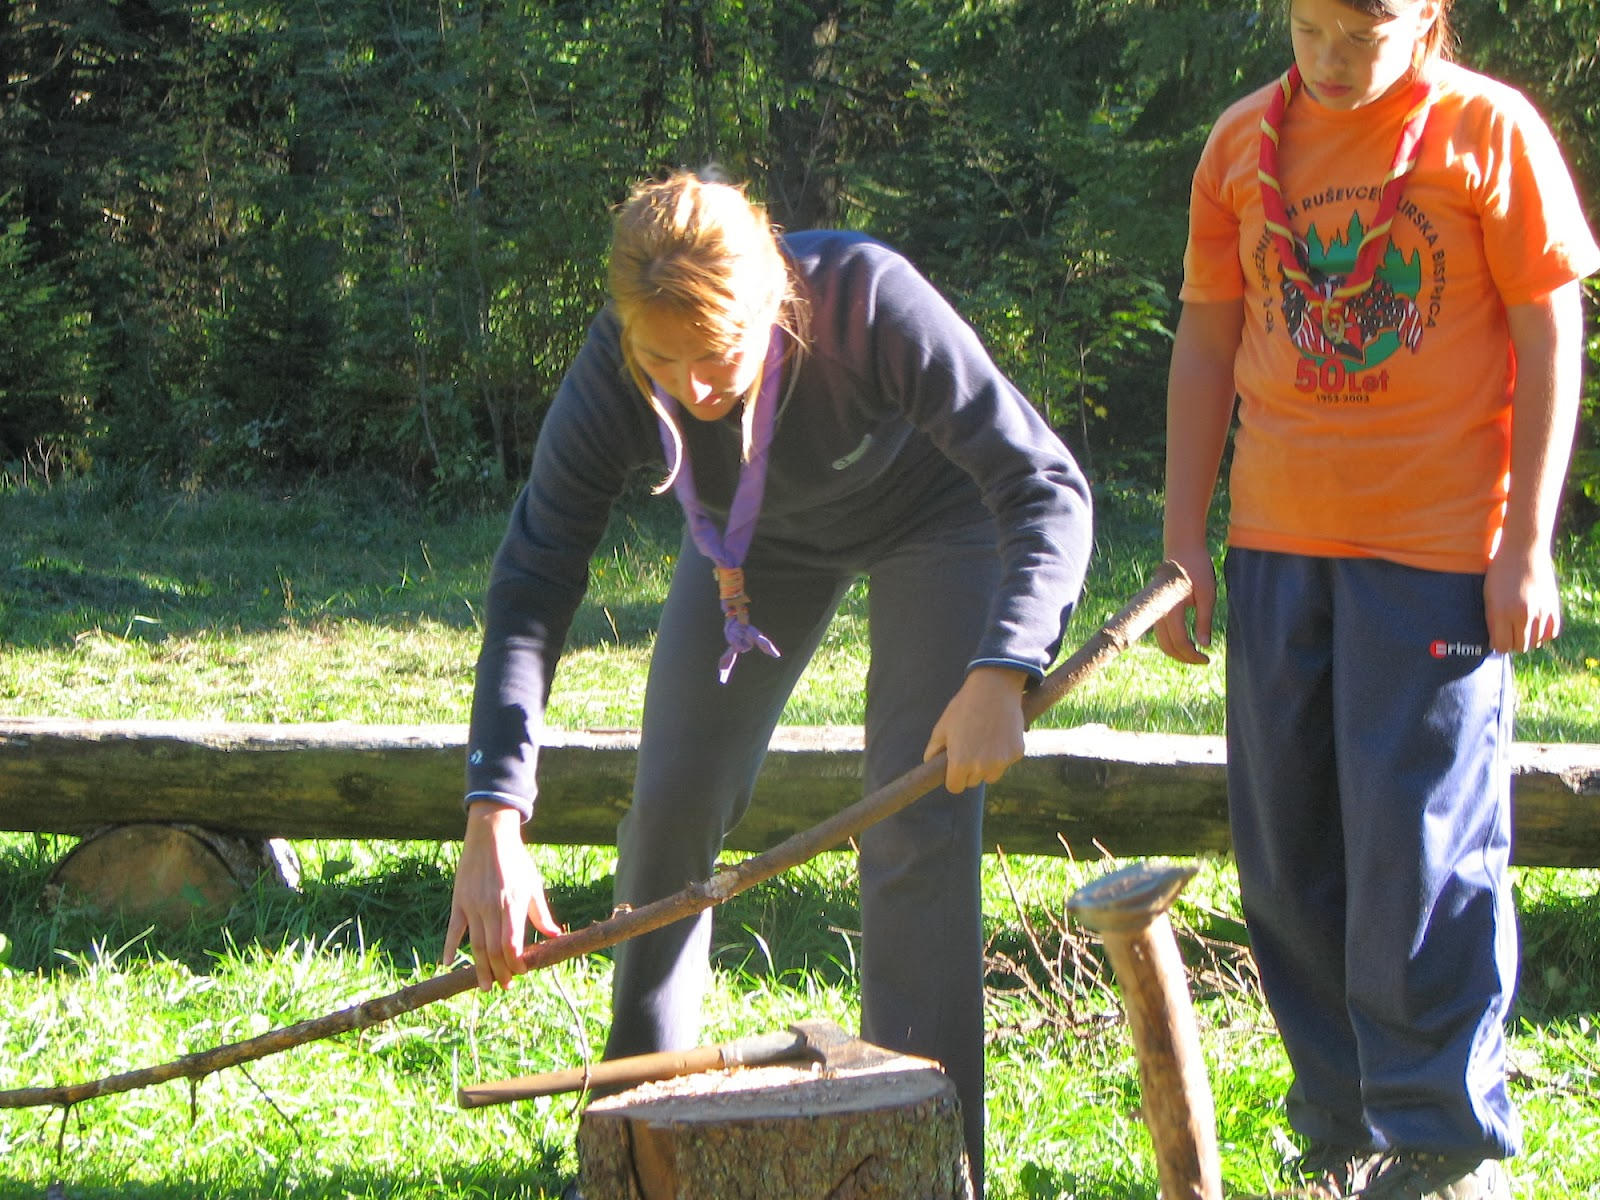 Vodov izlet, Ilirska Bistrica 2005 - Picture%2B210.jpg